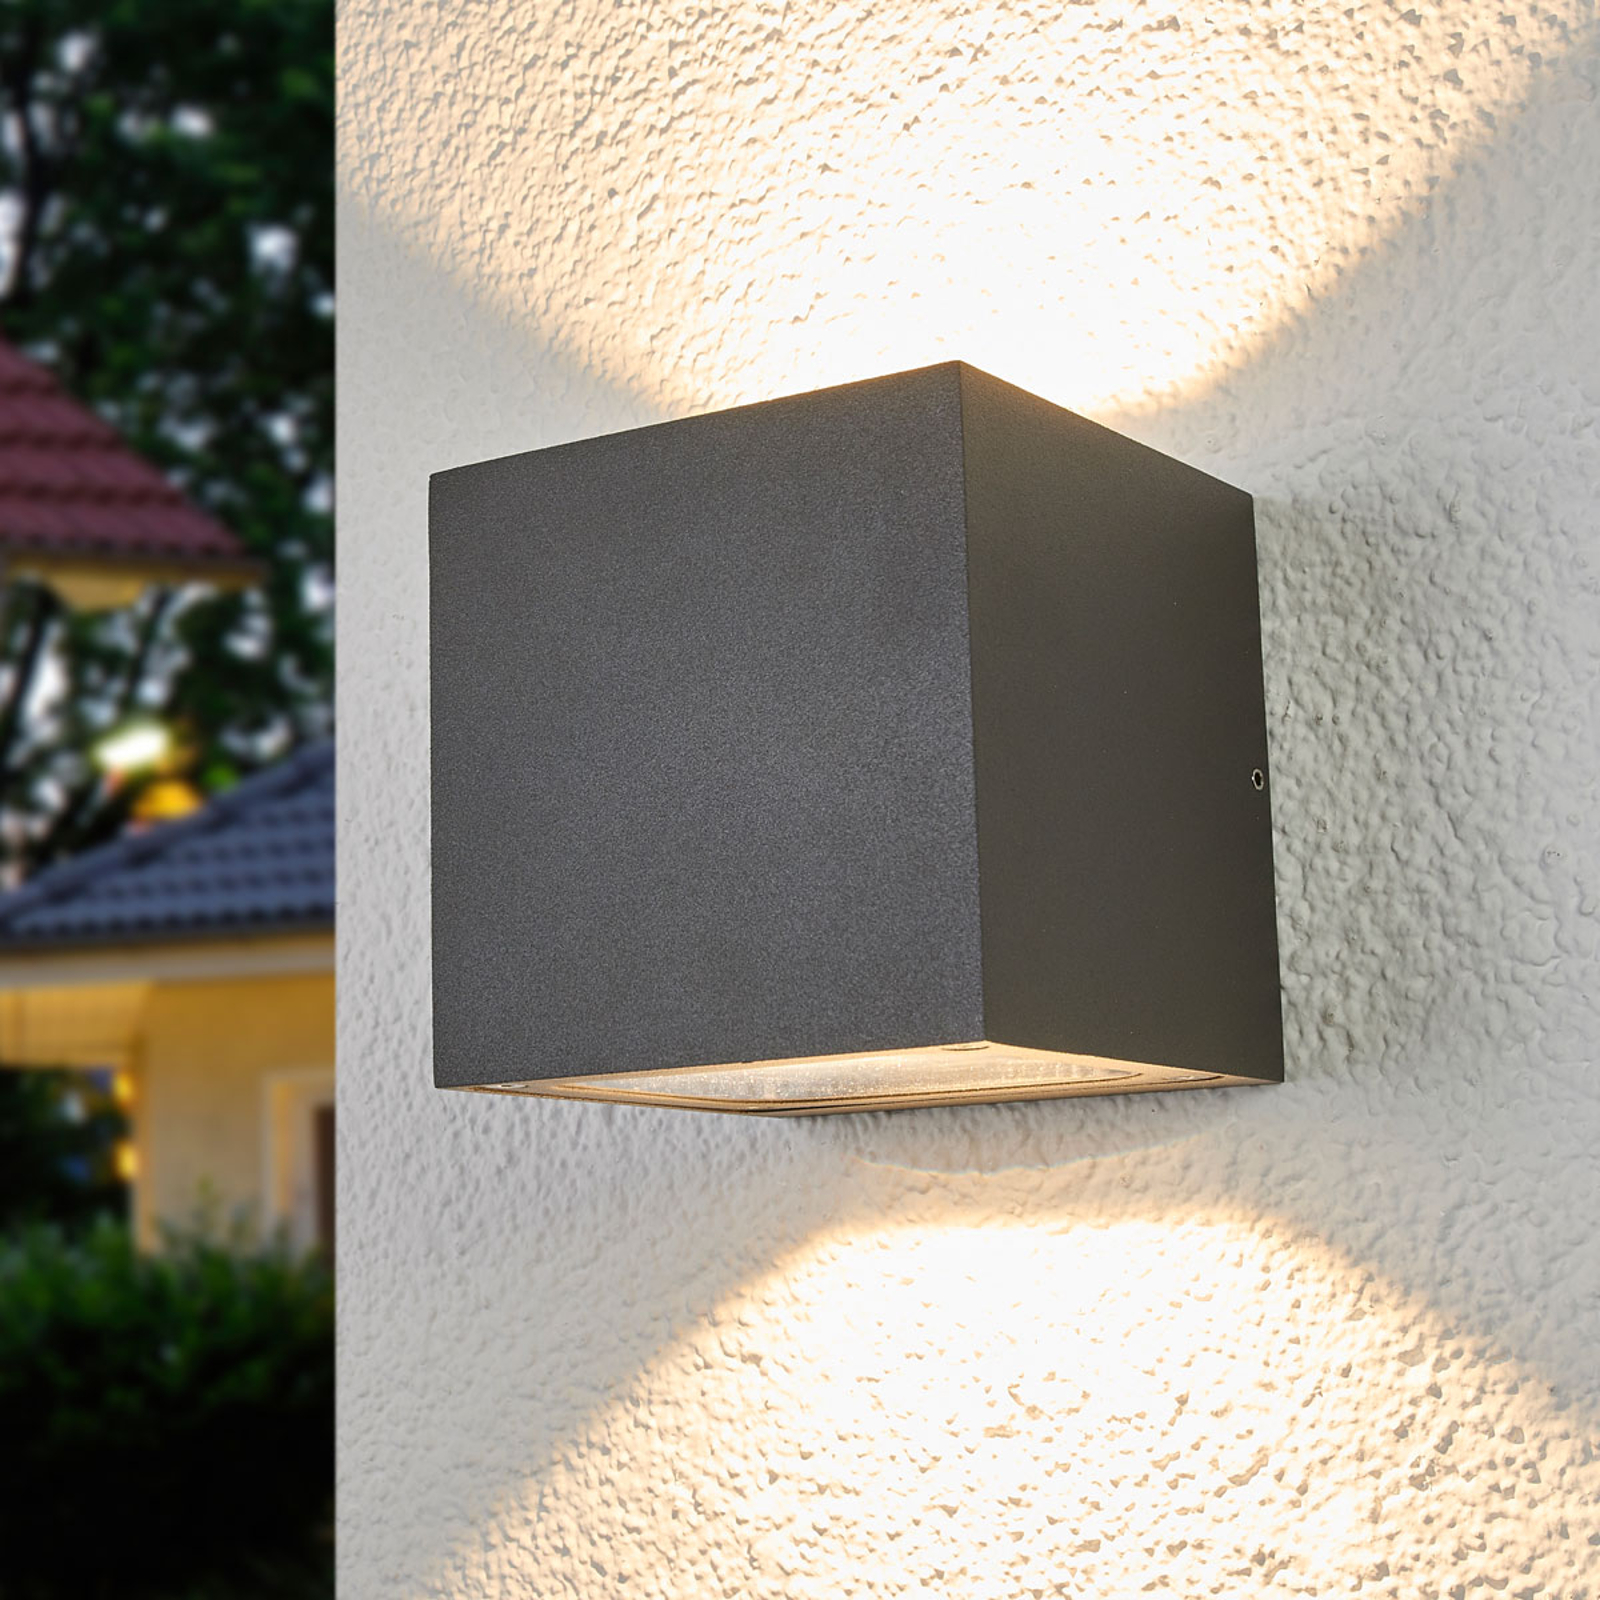 Efficace applique da esterni LED Merjem